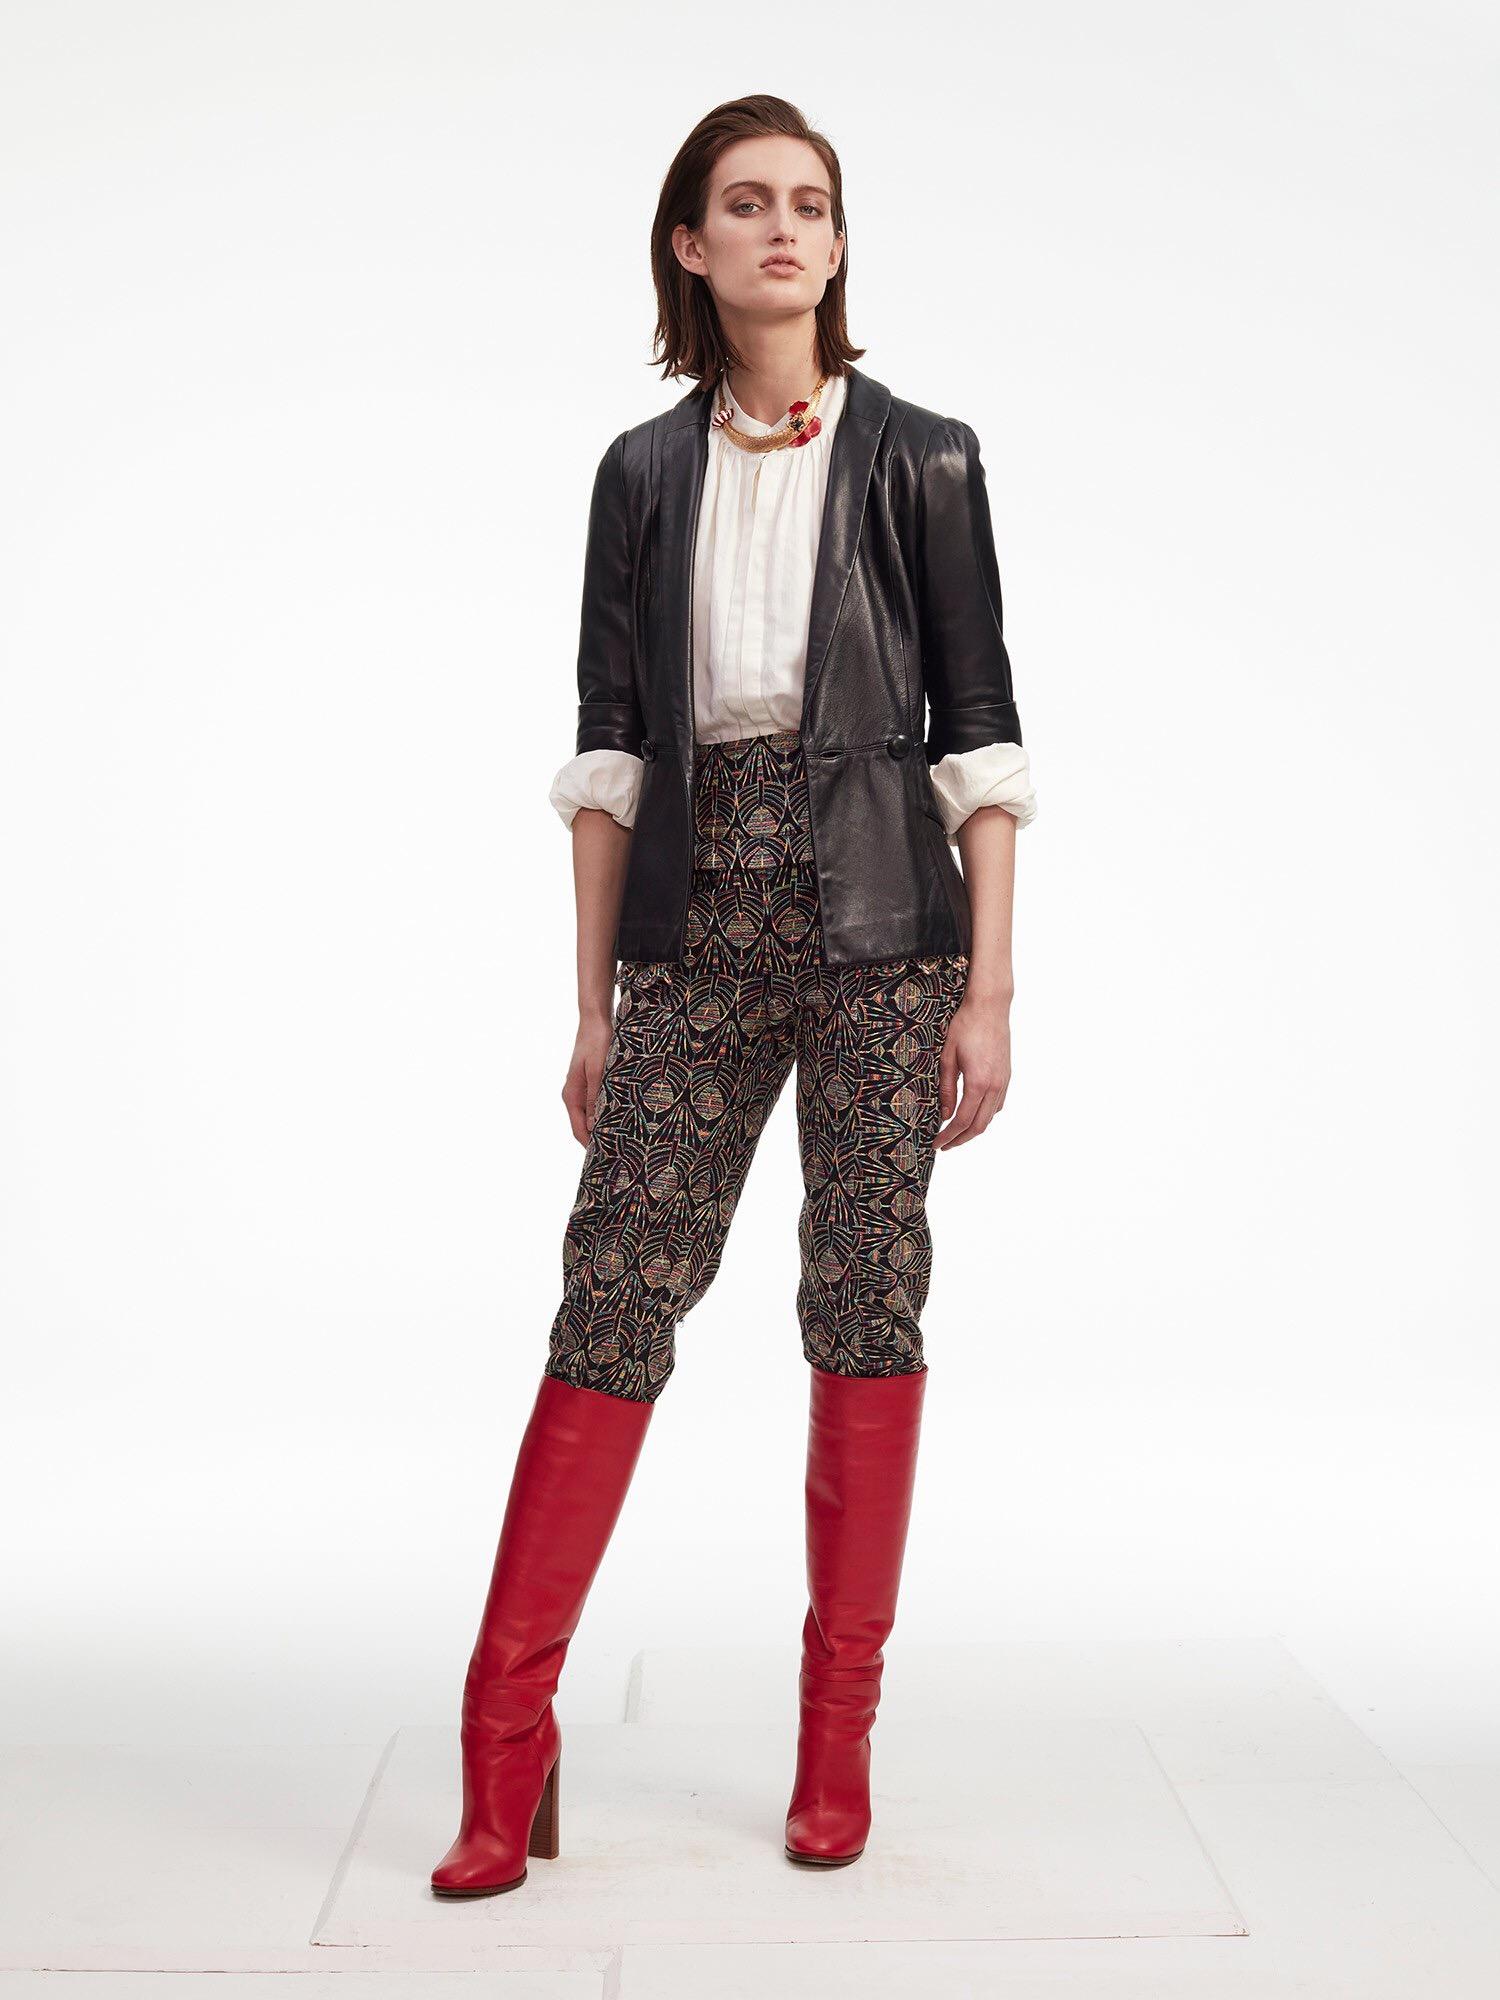 The Billion Dollar Bust - Four Corners Jane mayle fashion designer